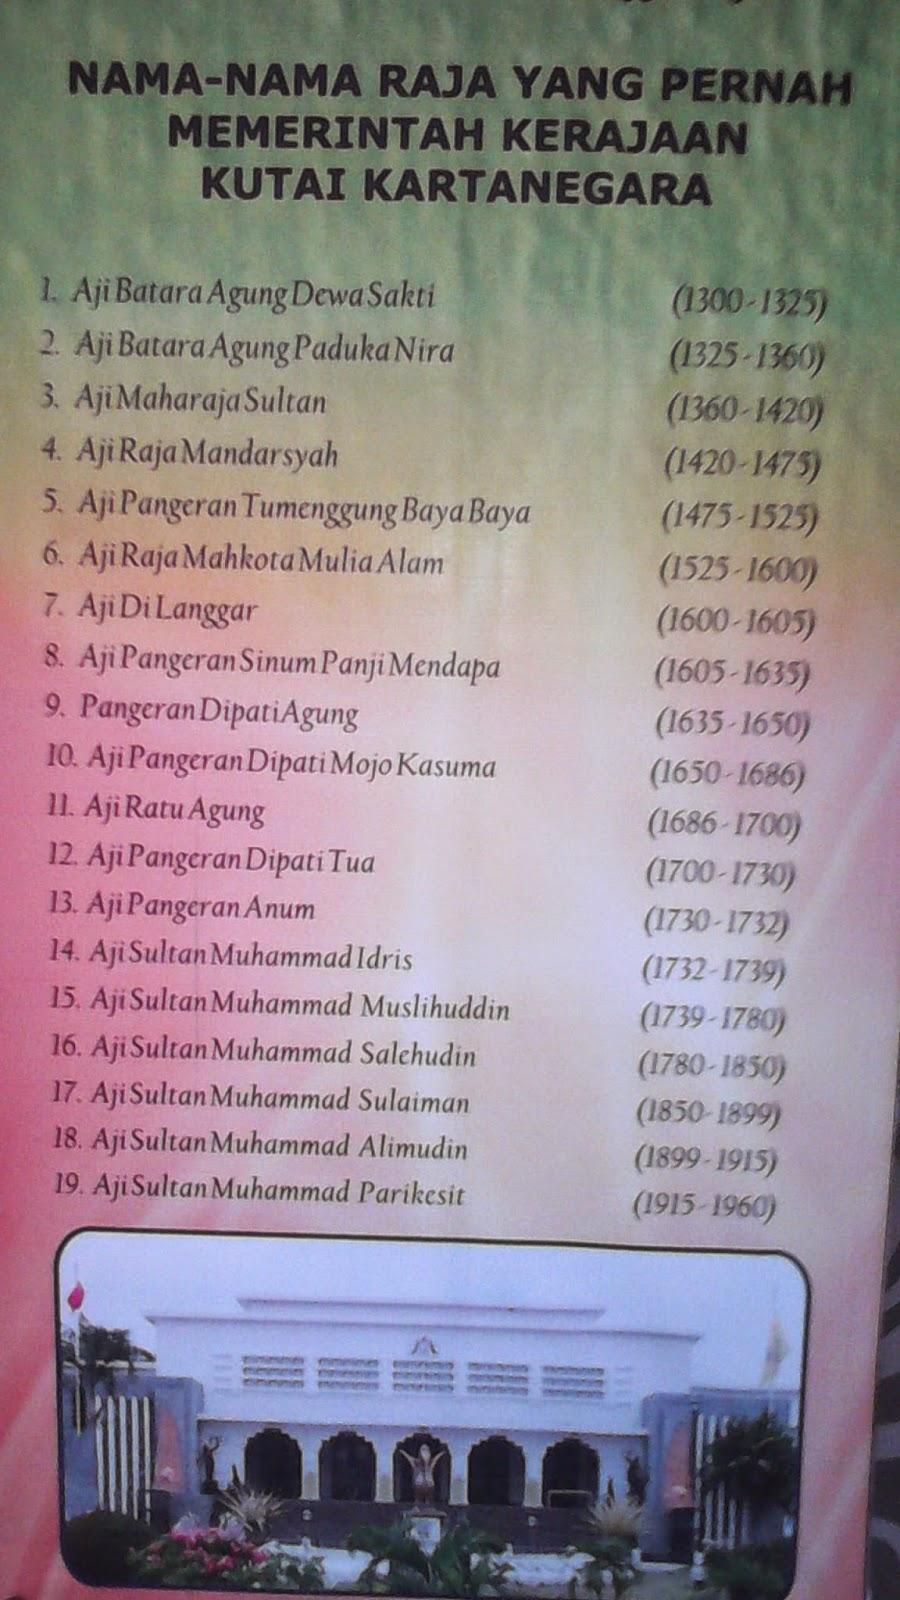 Museum Mulawarman Kutai Kartanegara